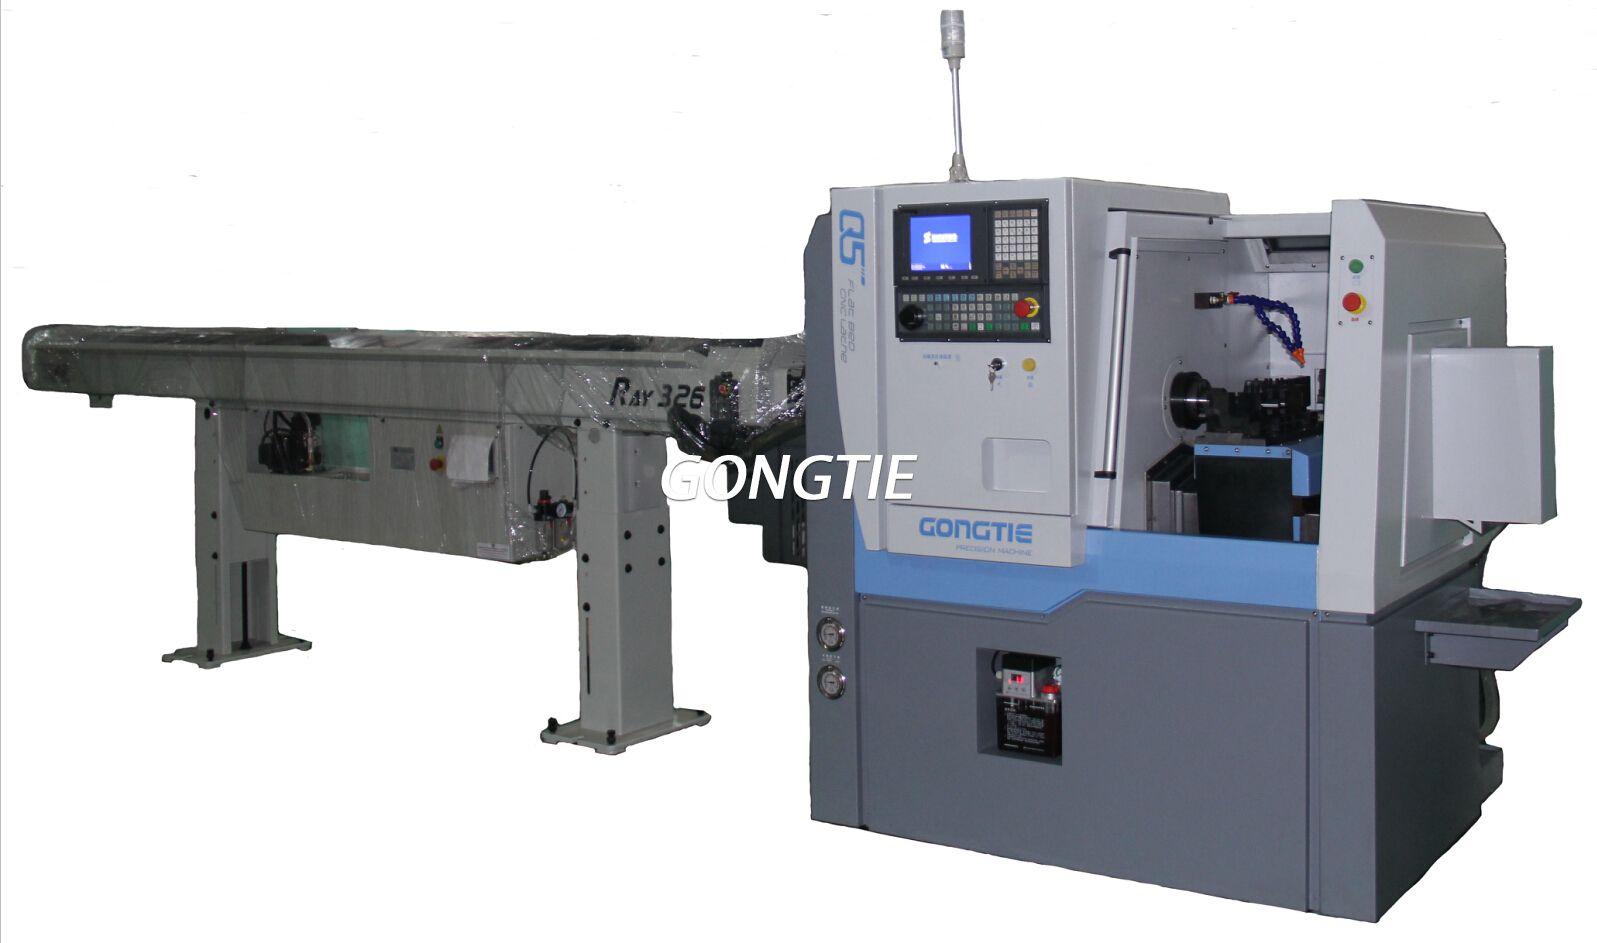 CNC lathe with bar feeder